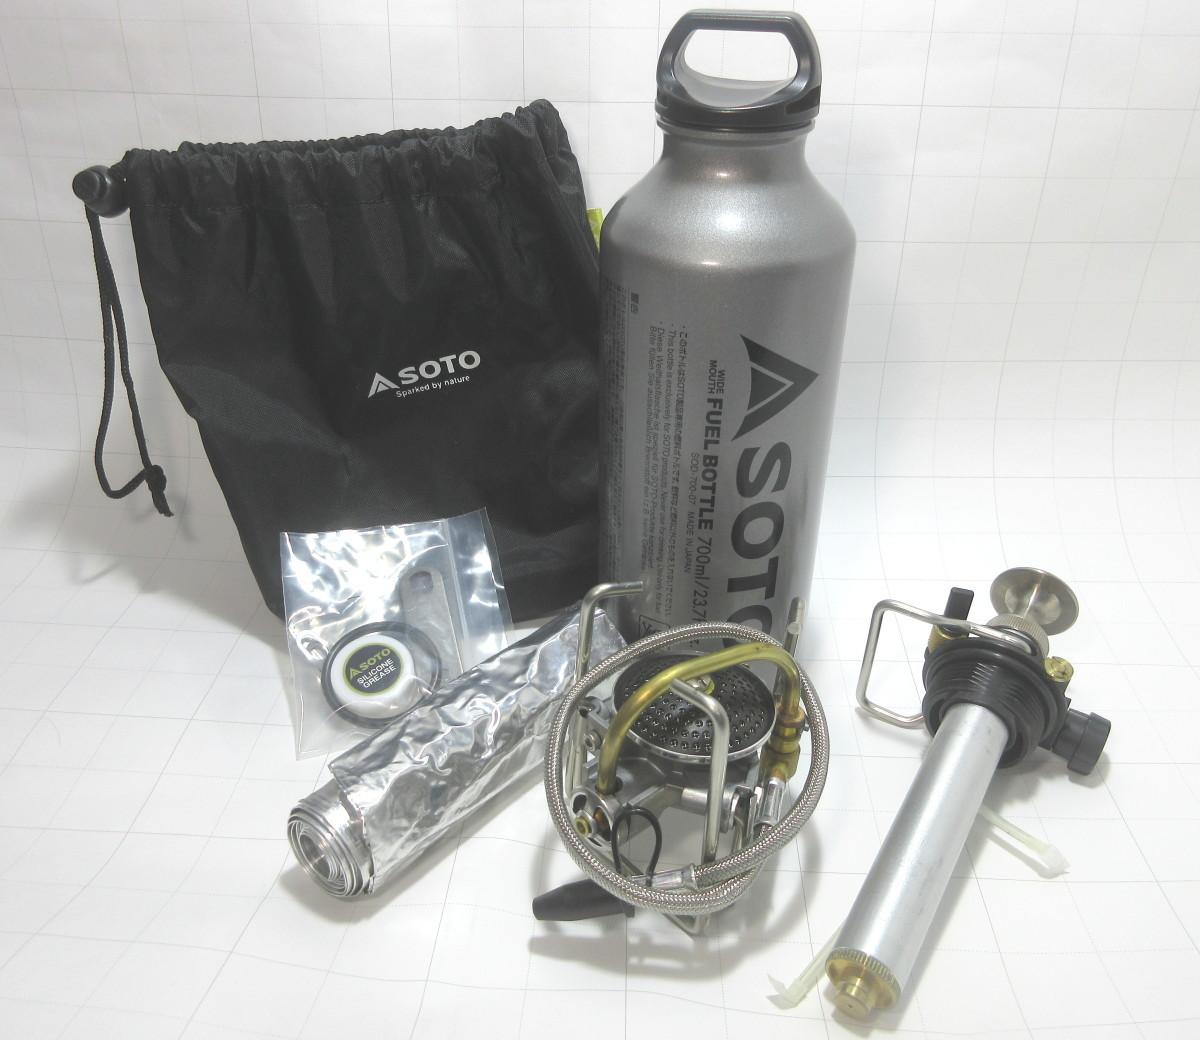 SOTO MUKA ストーブ SOD-371ガソリンストーブ 700mlボトル付き